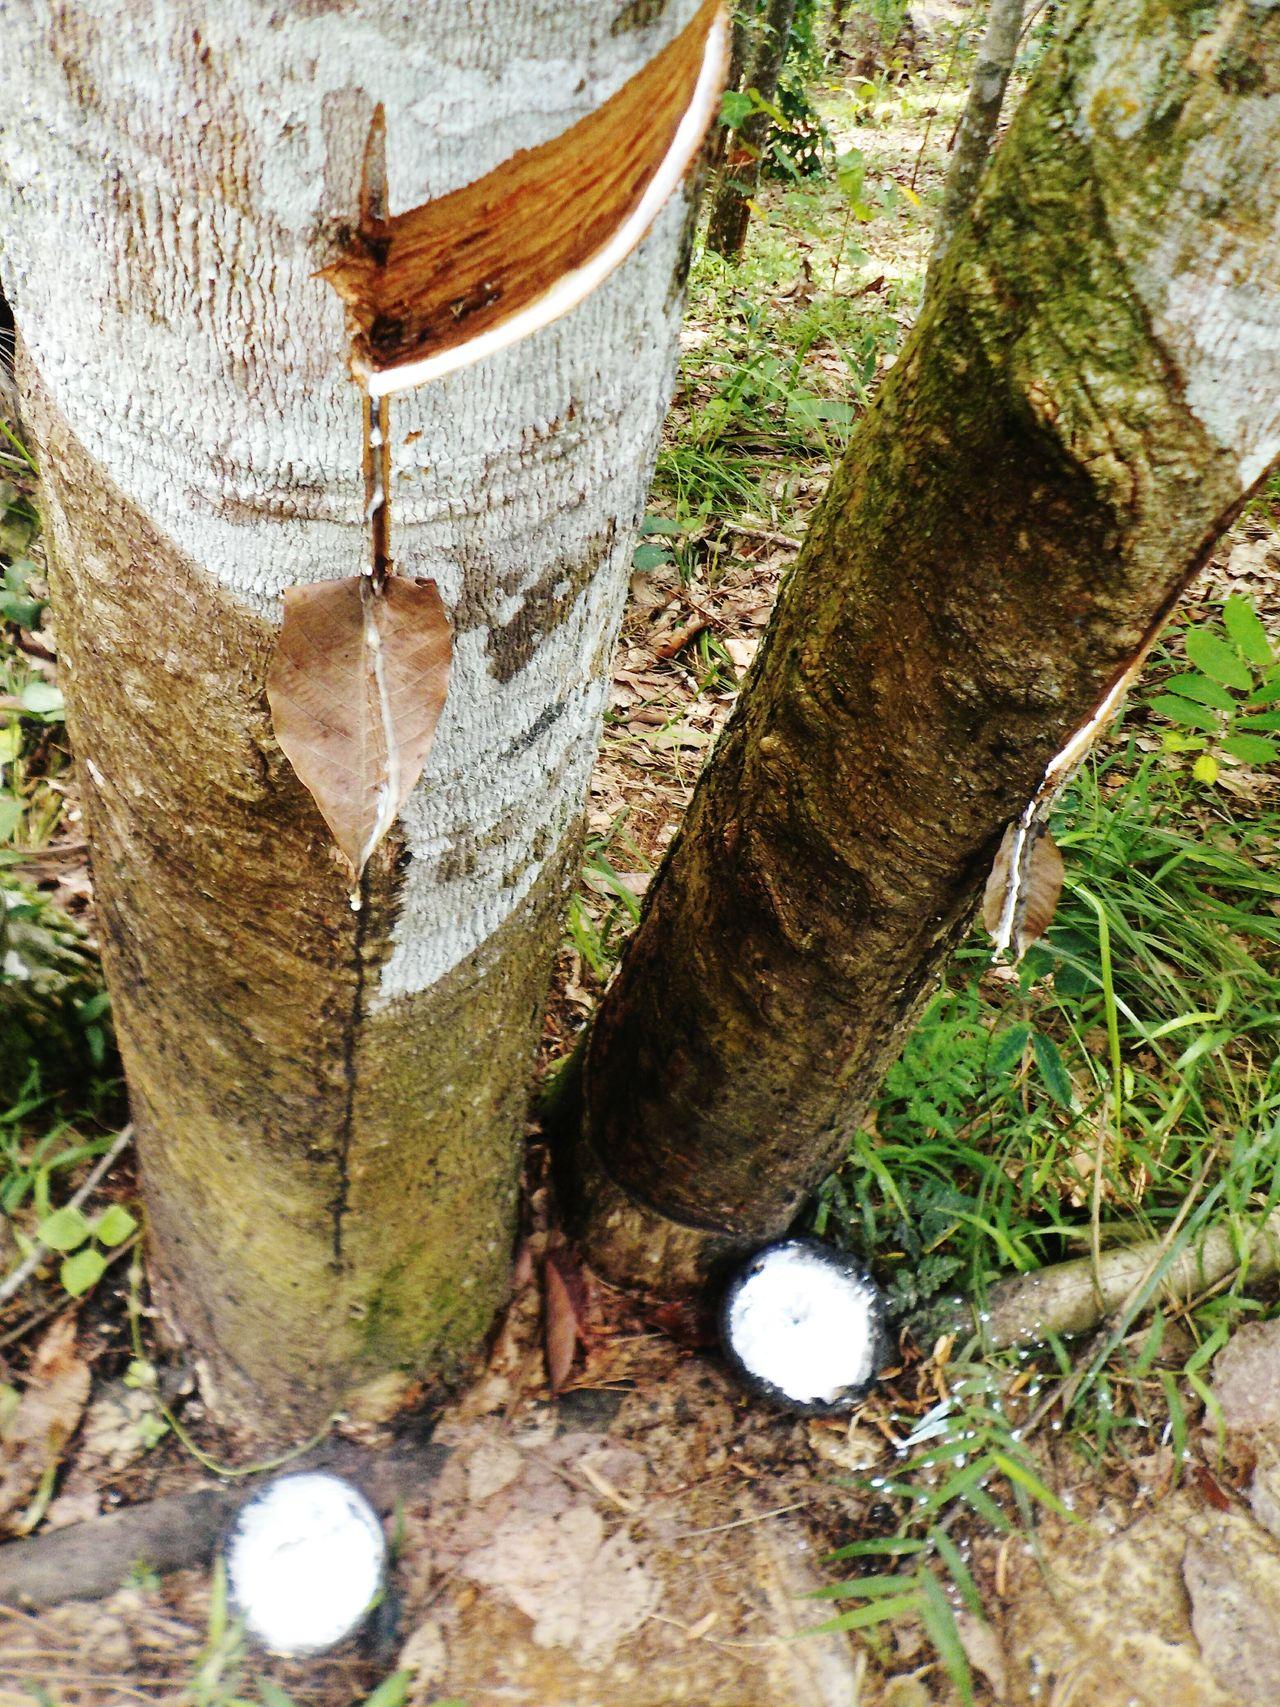 Rubber Harvest Rubber Plantation Rubber Tree Sumatera Sumatra